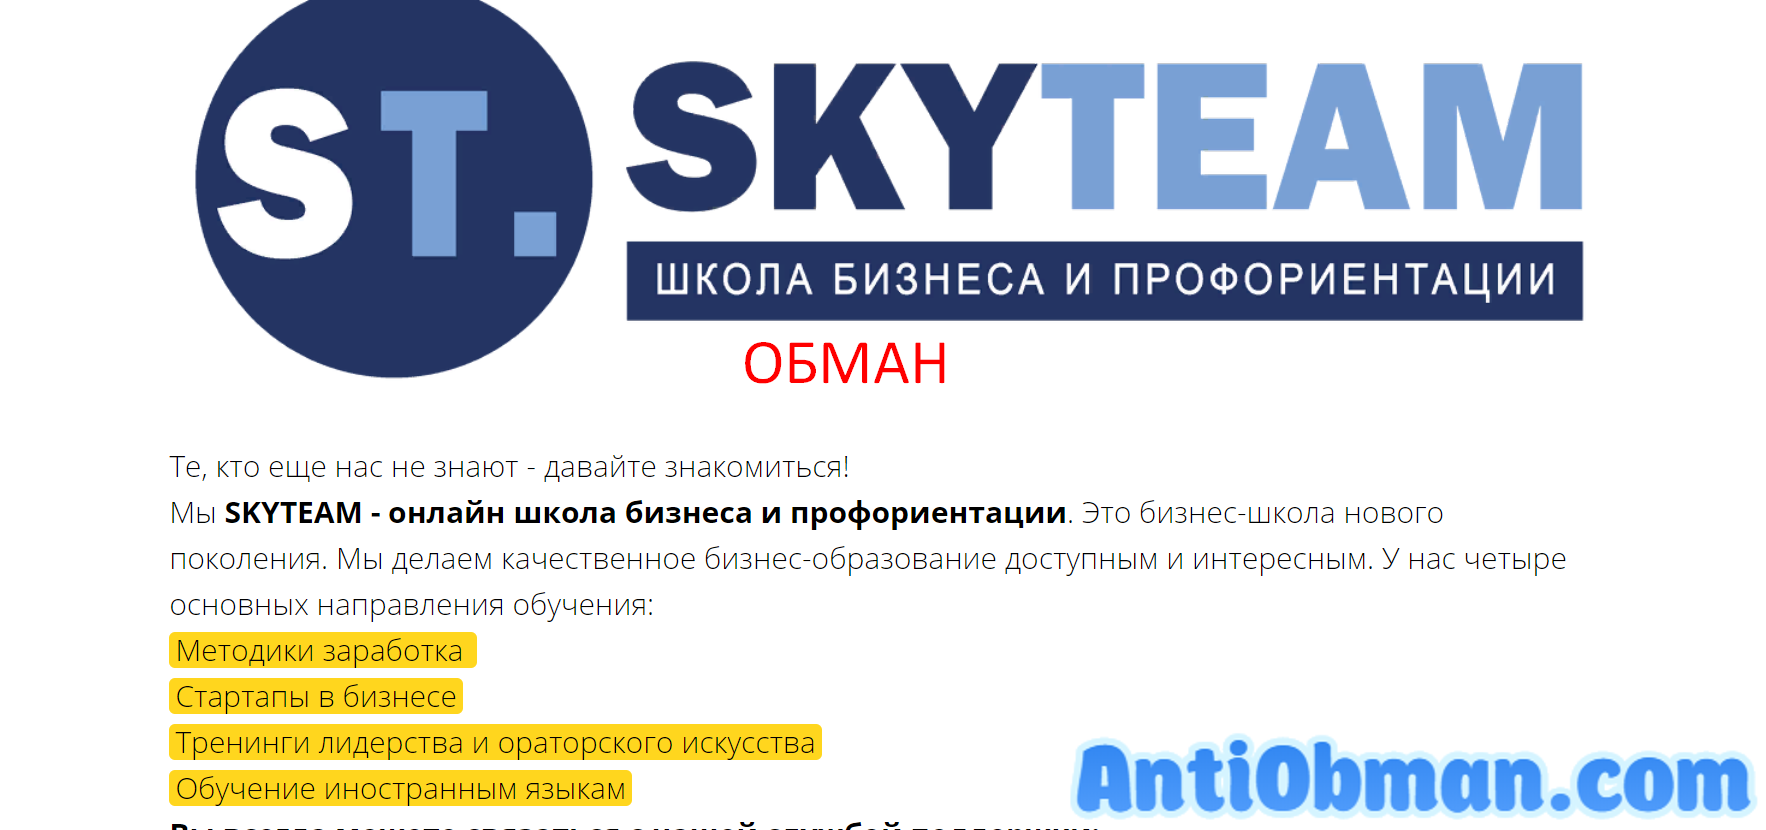 Система Скайворк - отзывы о курсе Skyteam. Развод?